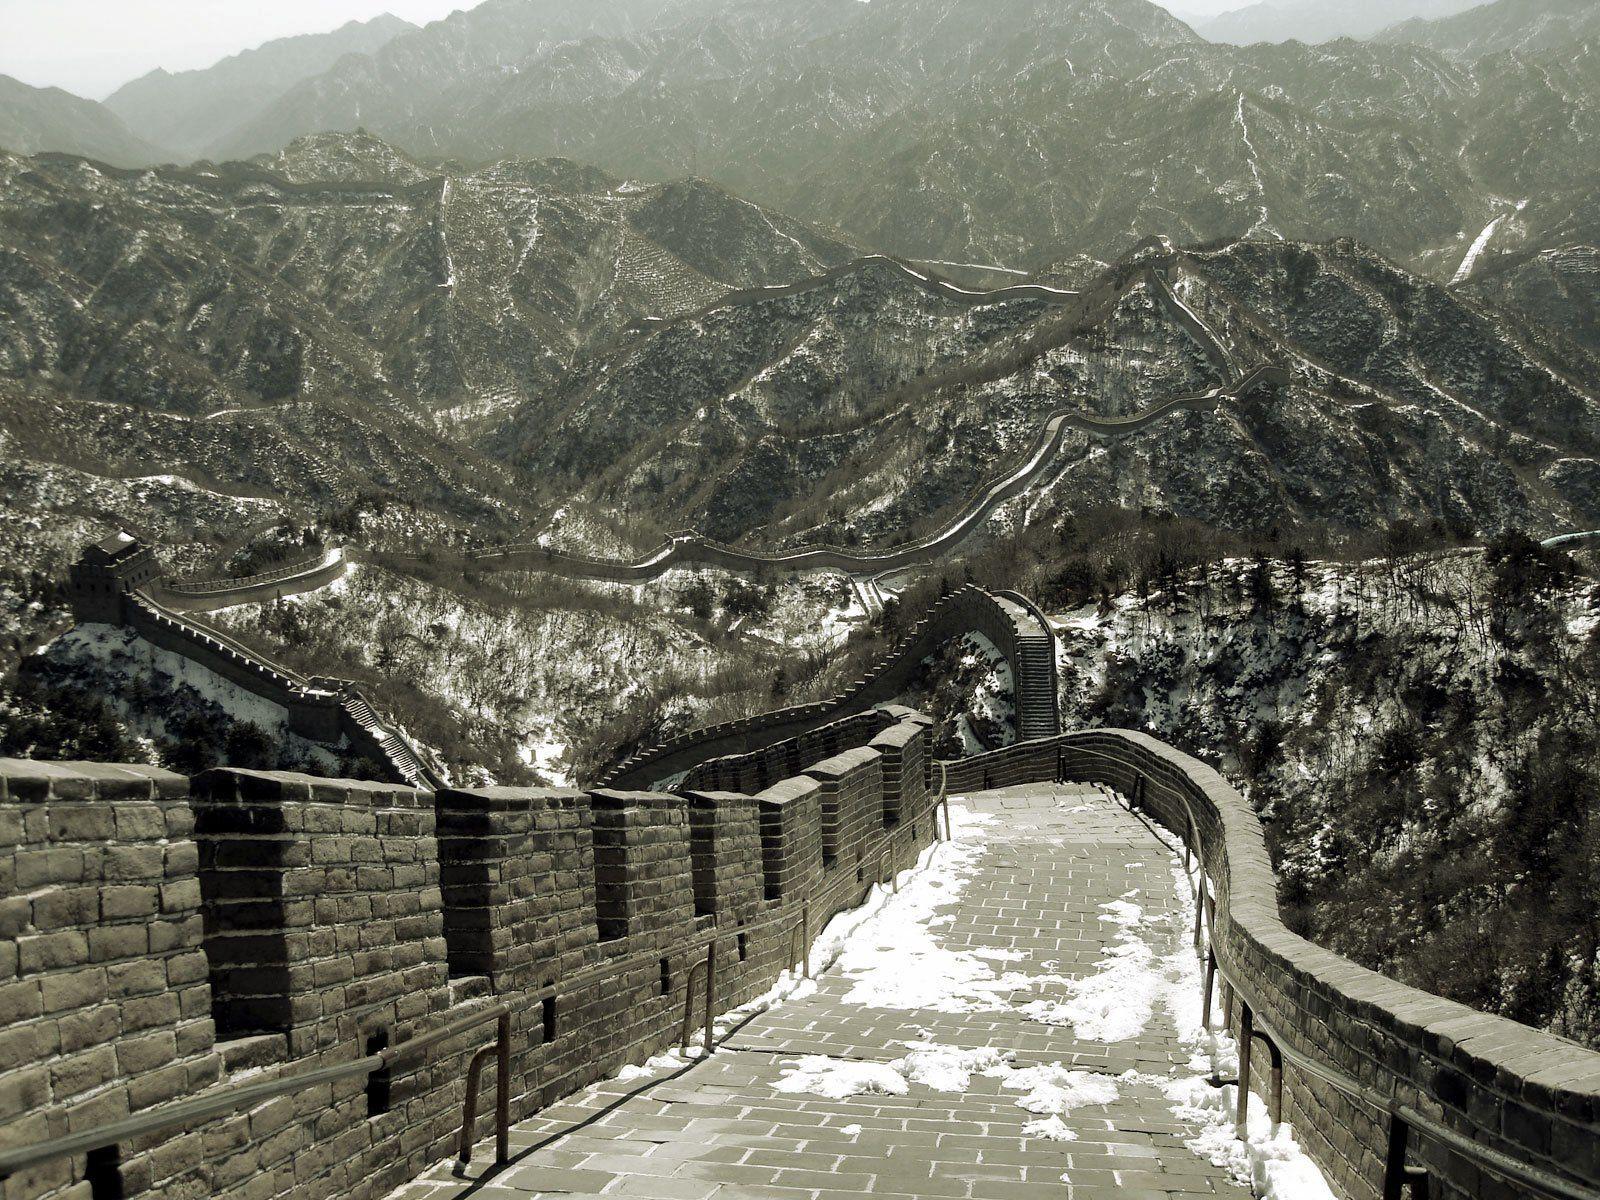 Great wall of china photographs world 7 wonders for A grande muralha da china